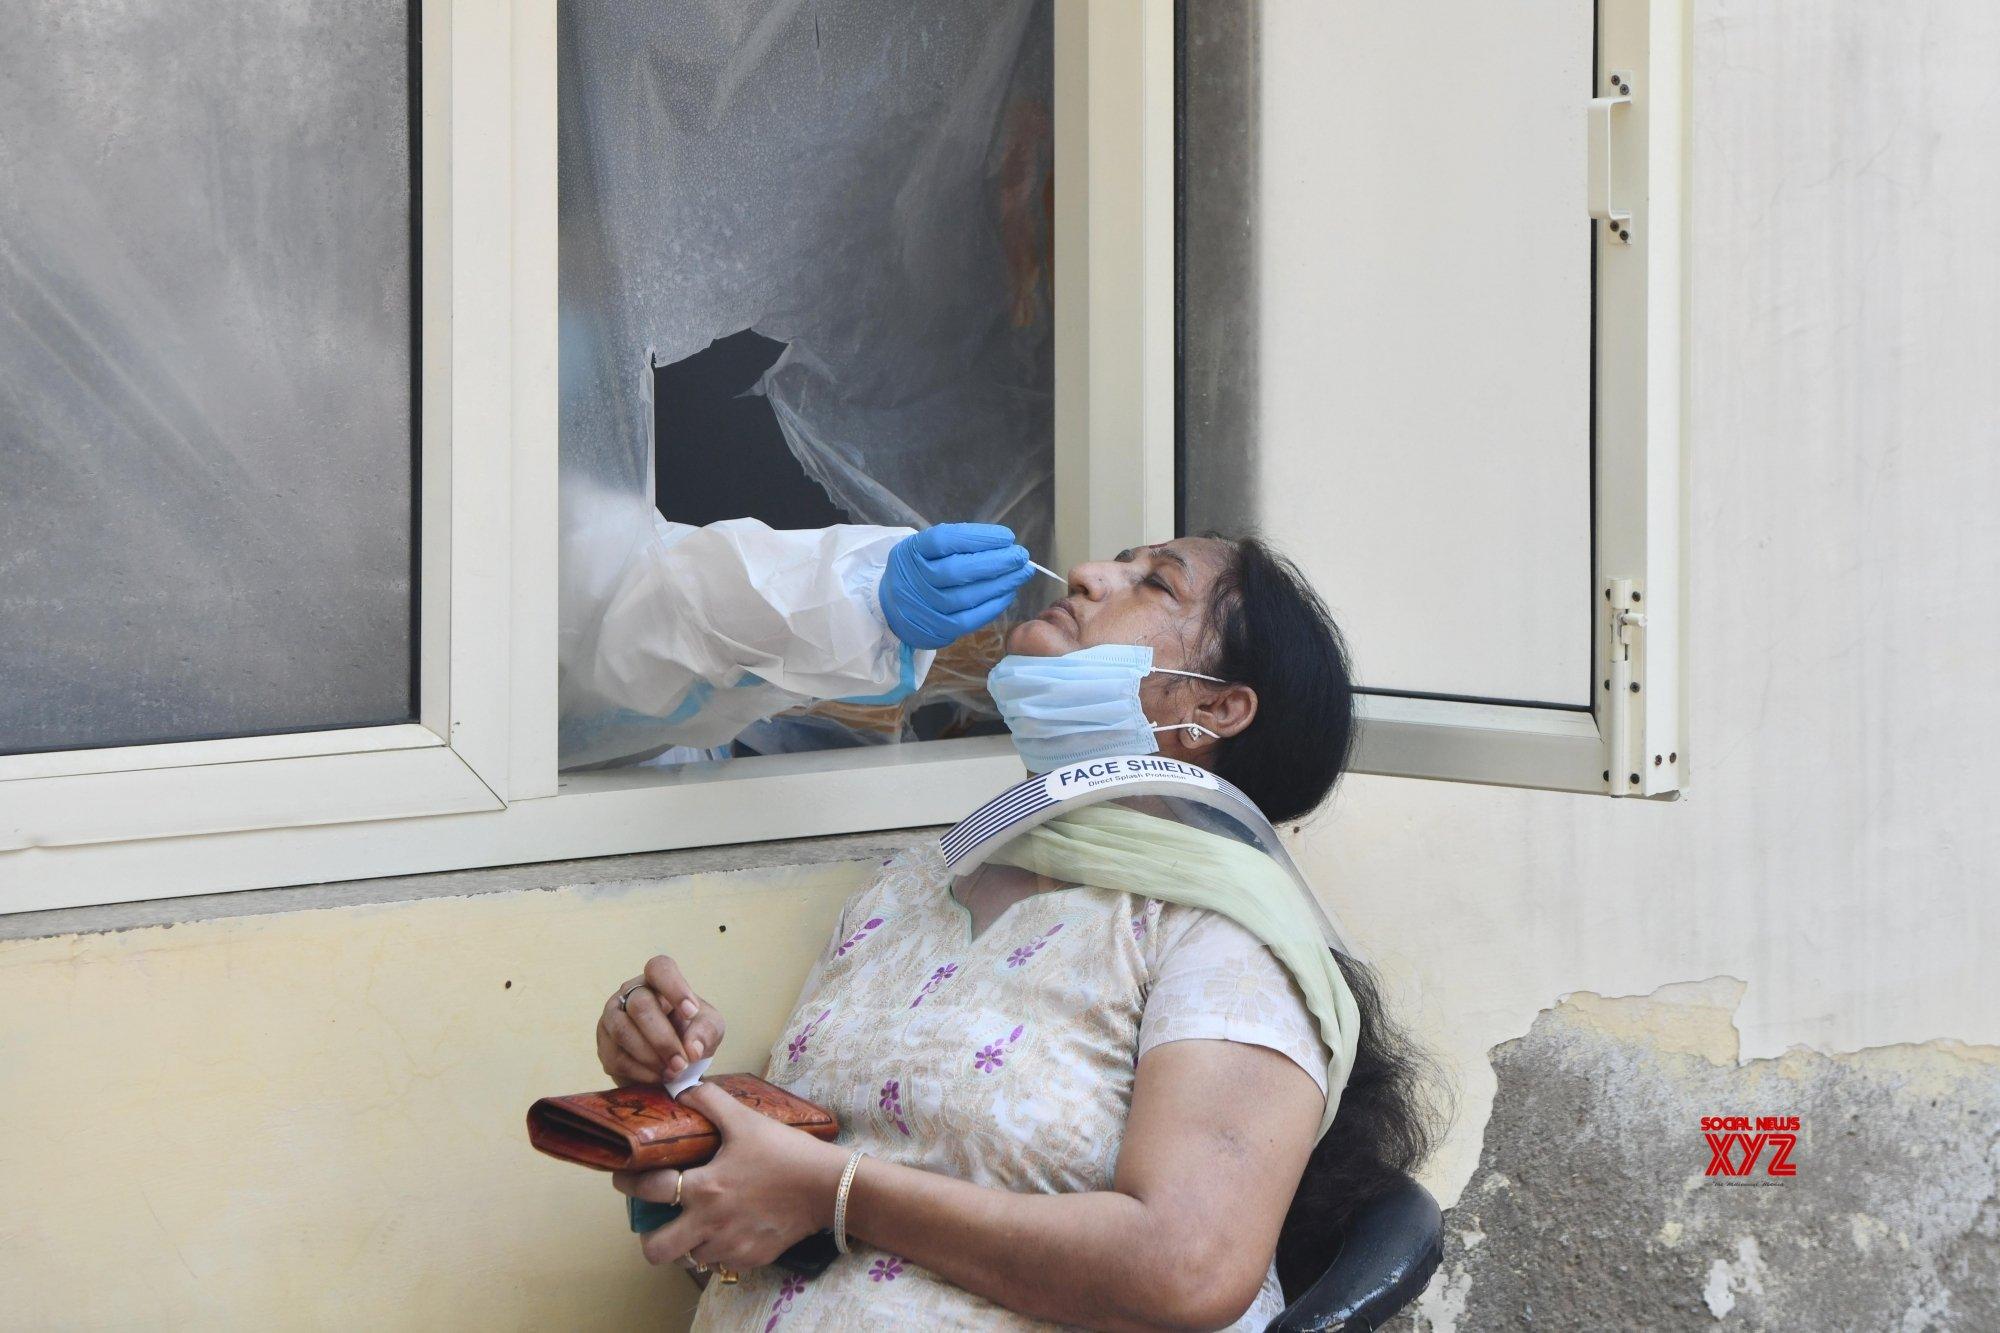 Maharashtra Covid cases cross 11 lakh, deaths down